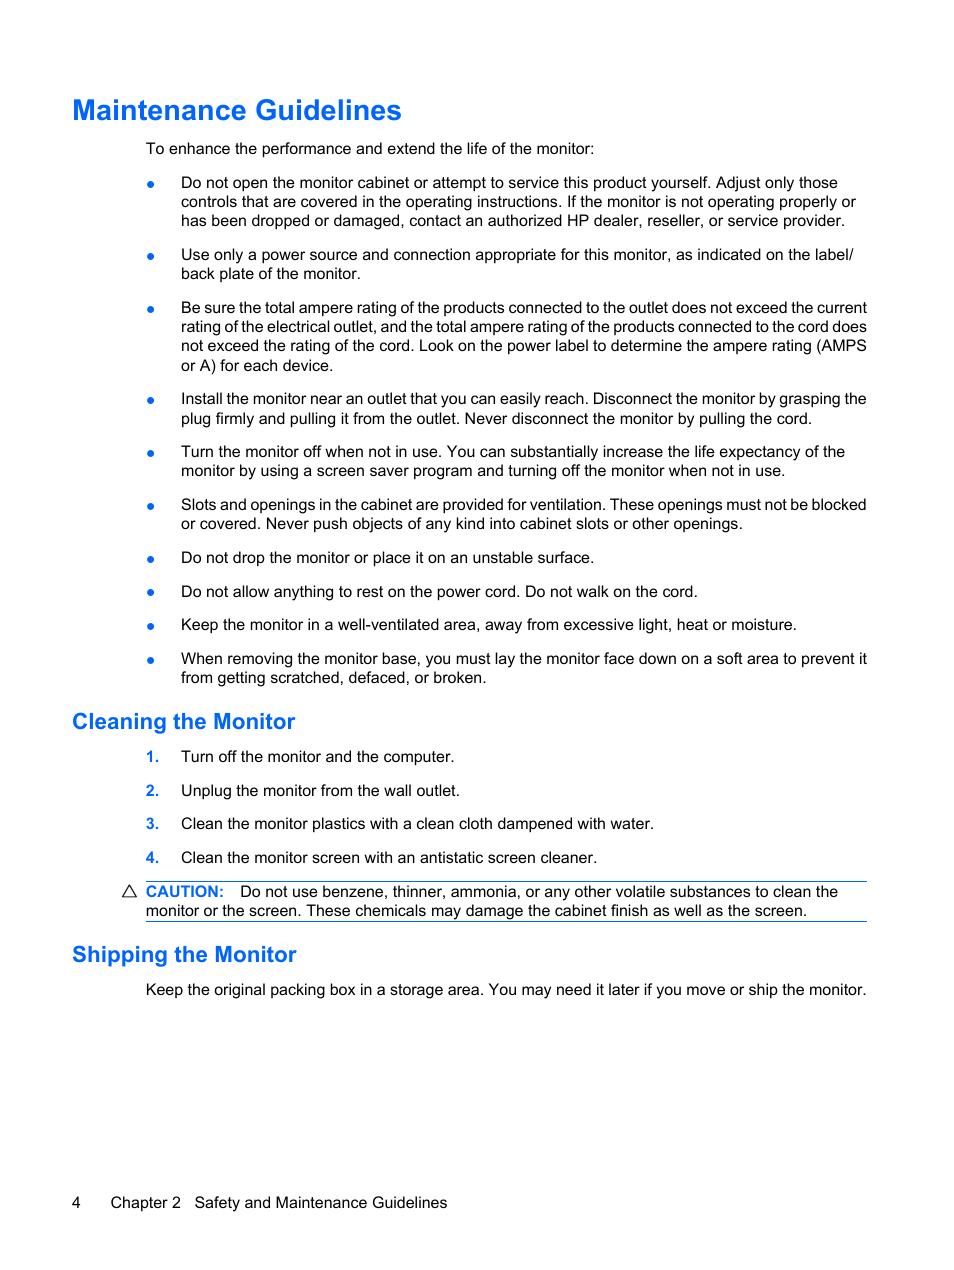 lcd monitor maintenance manual professional user manual ebooks acer v223w monitor user manual acer monitor owner's manual